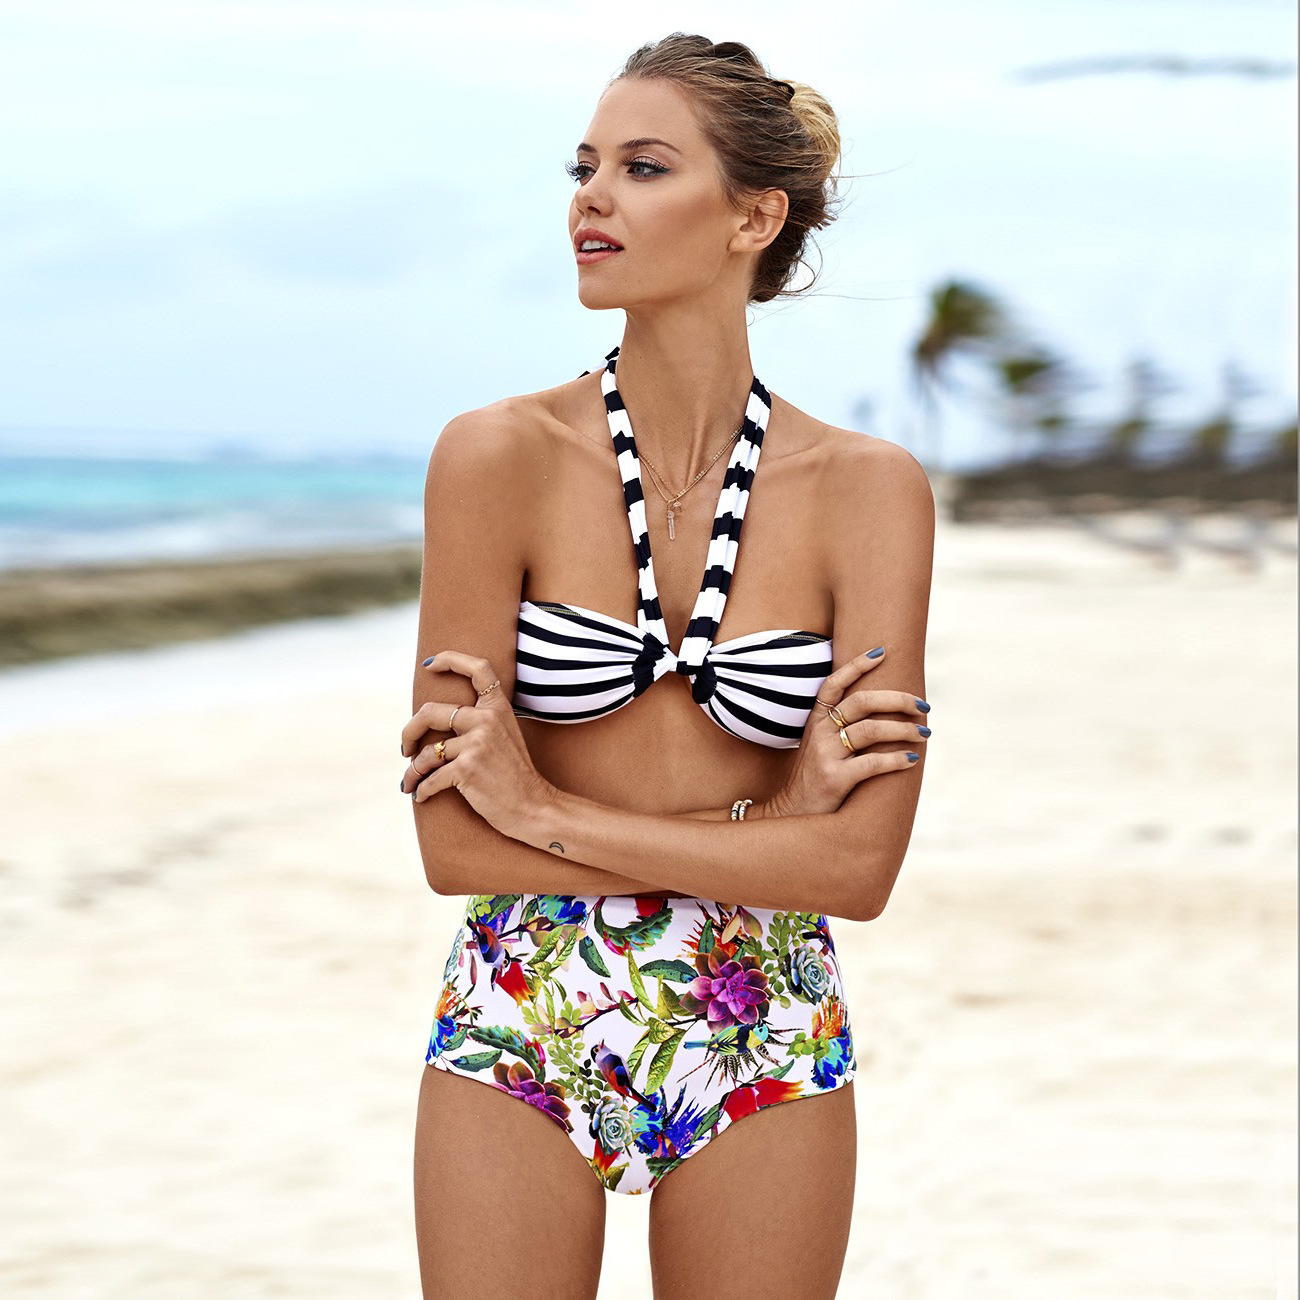 Summer Style Bikini 2016 New Fashion Print Strapless Swimwear Women High Waist Swimsuit Sexy